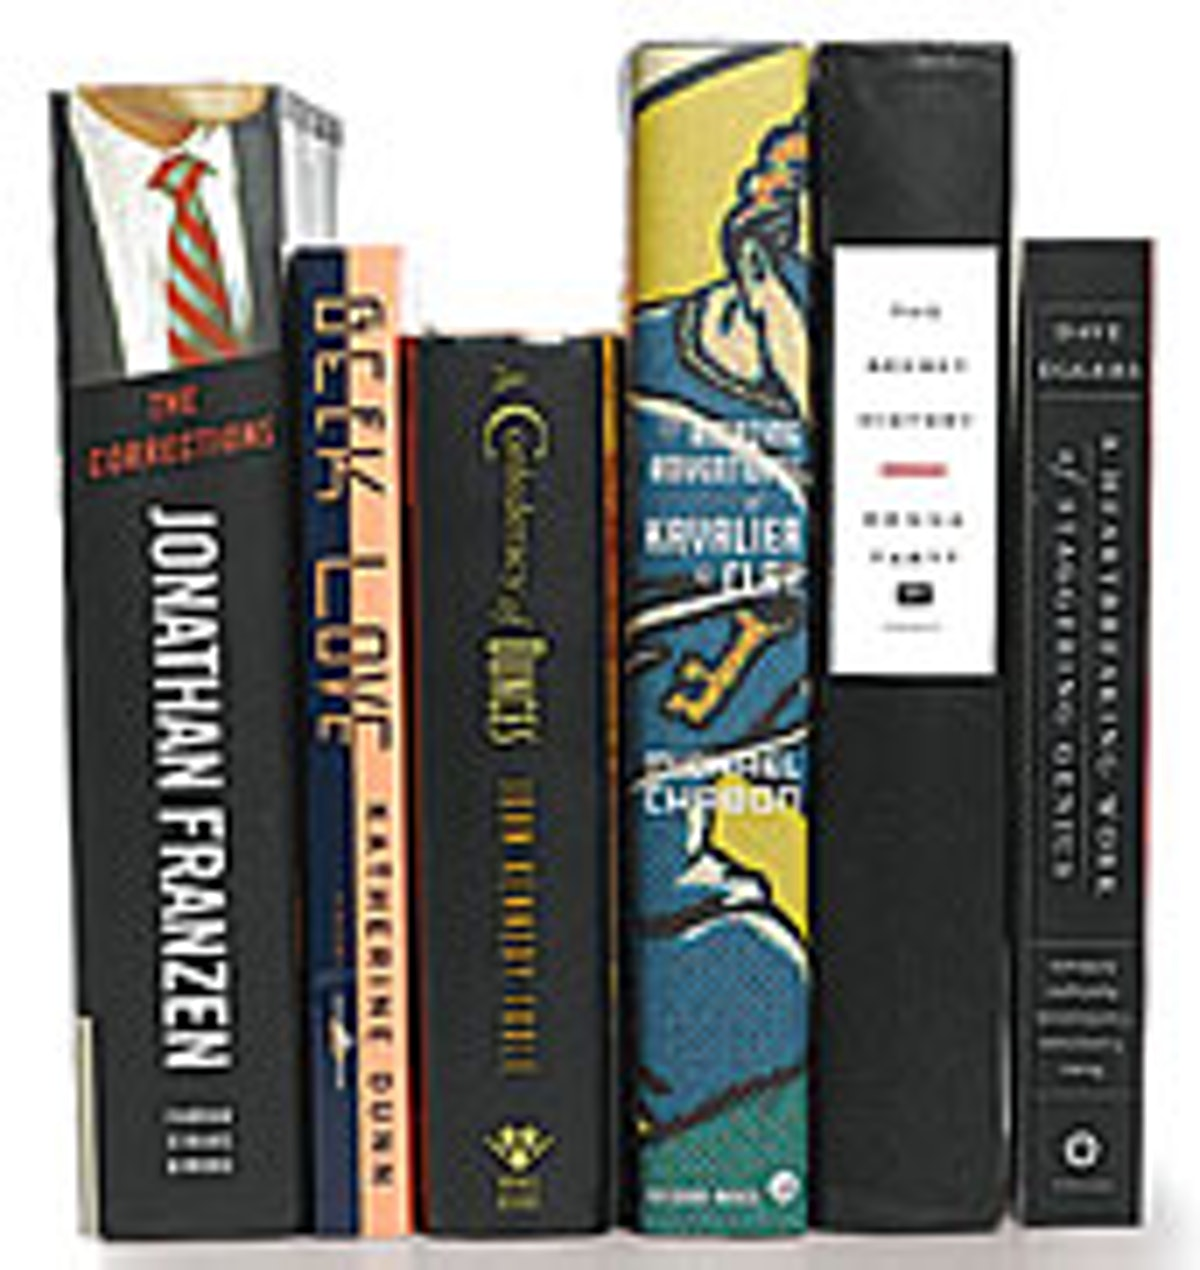 celi_alist_books_search.jpg